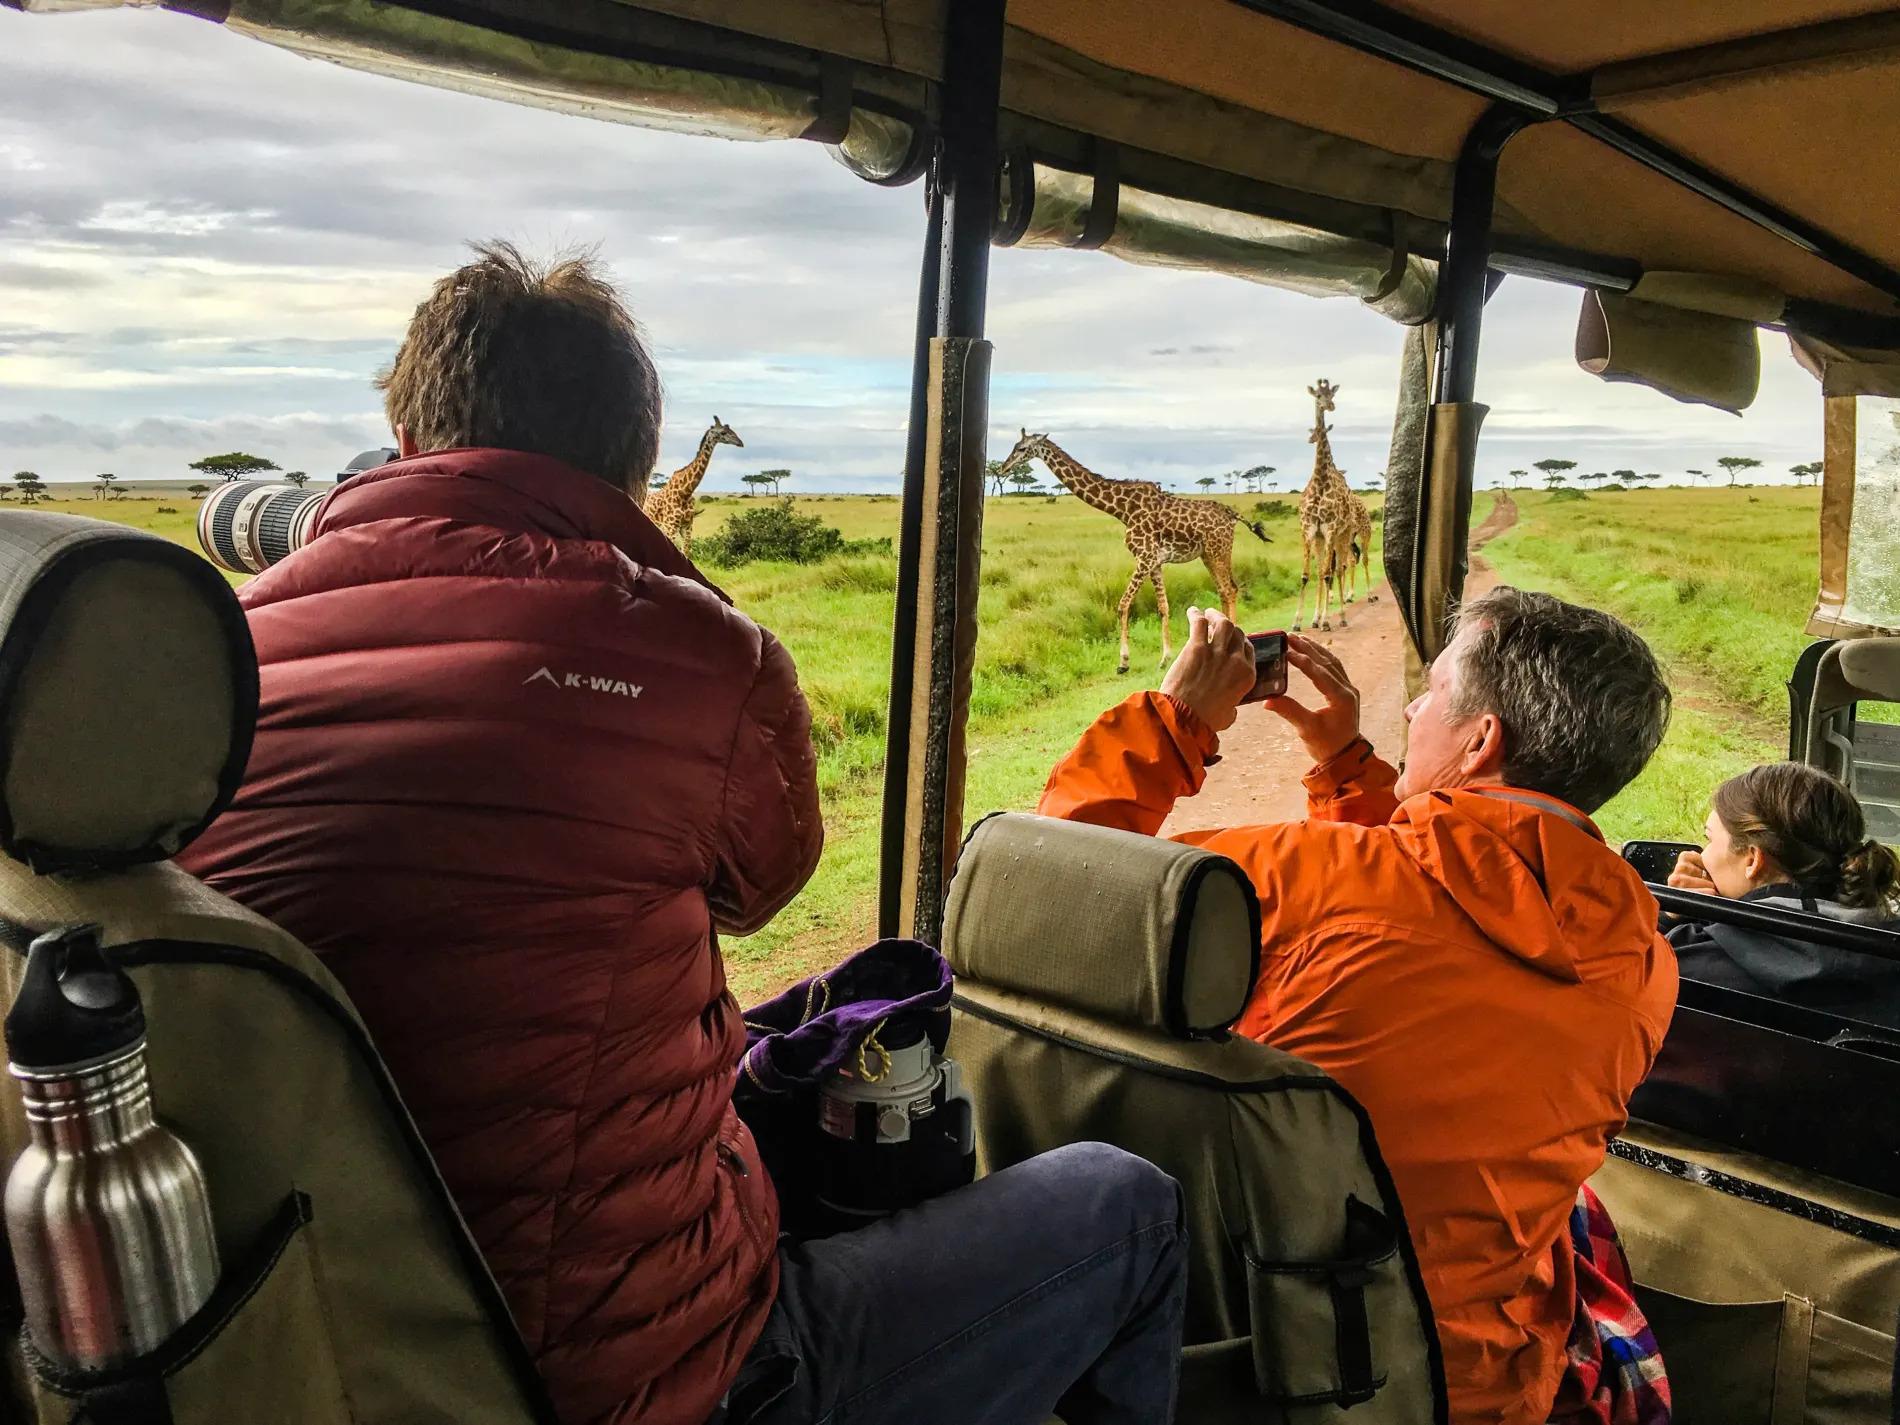 Taking pics of giraffes